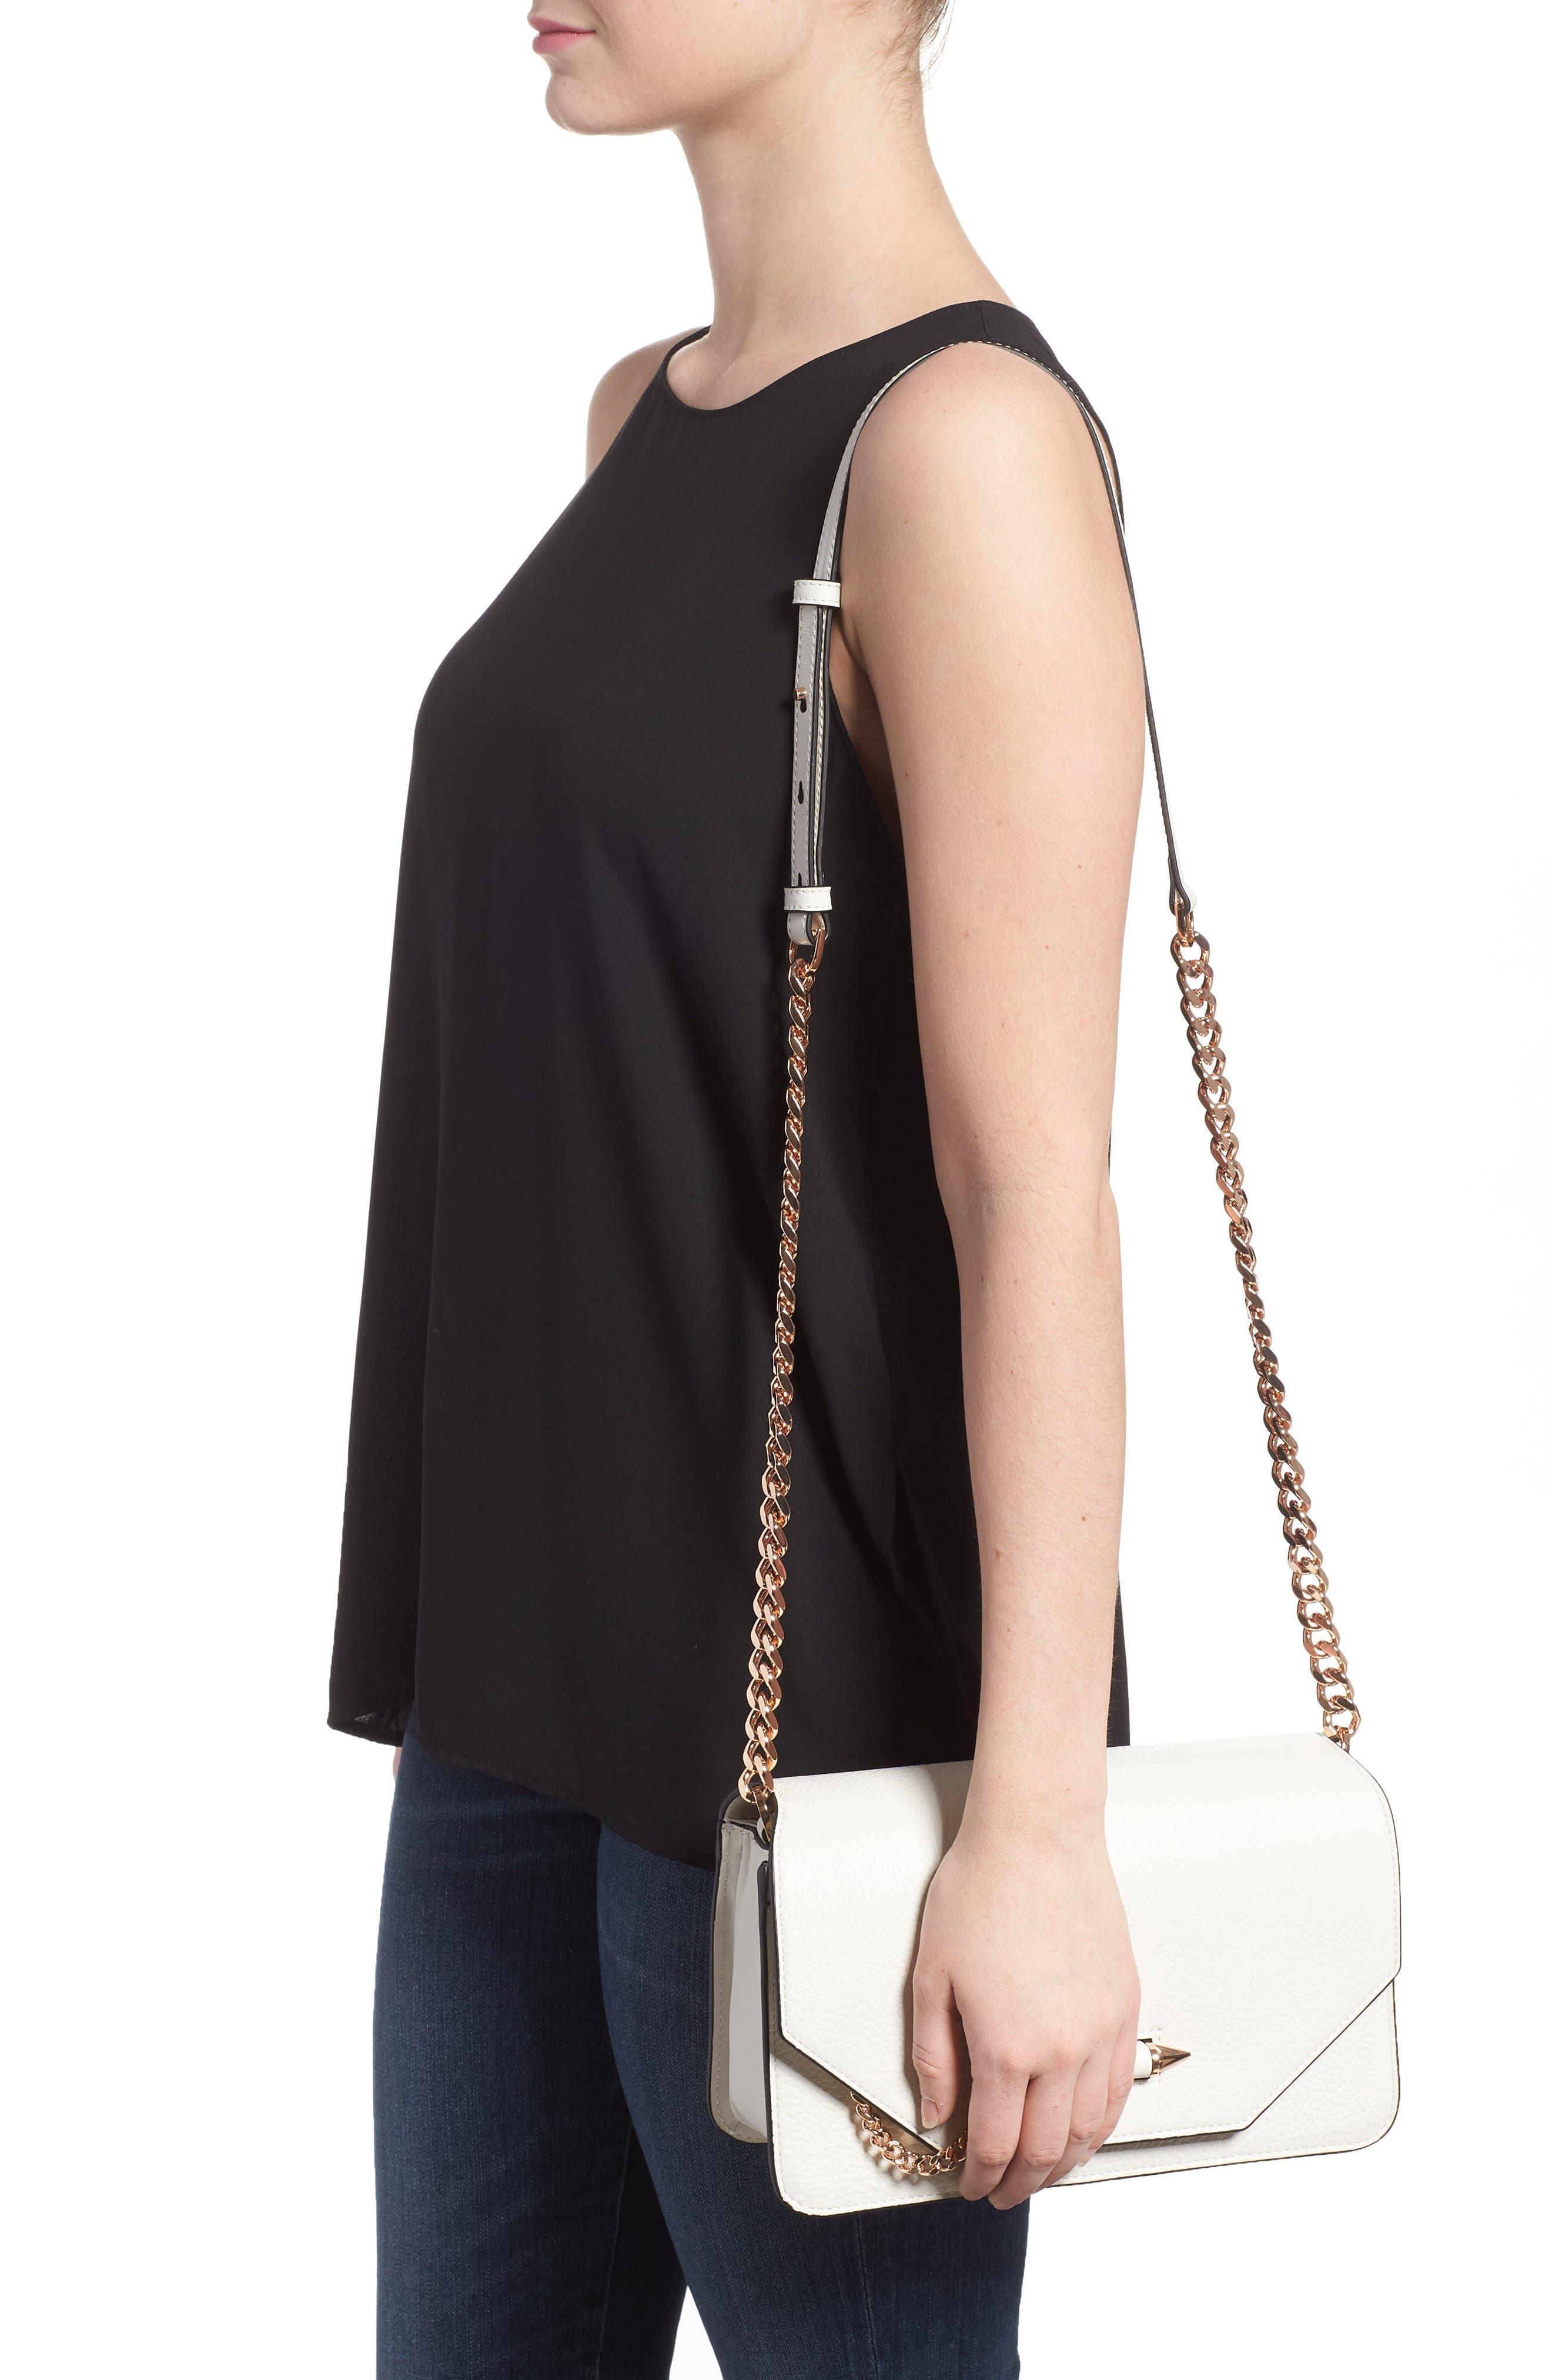 Cortney Nappa Leather Shoulder/Crossbody Bag,                             Alternate thumbnail 2, color,                             White/ Rose Gold